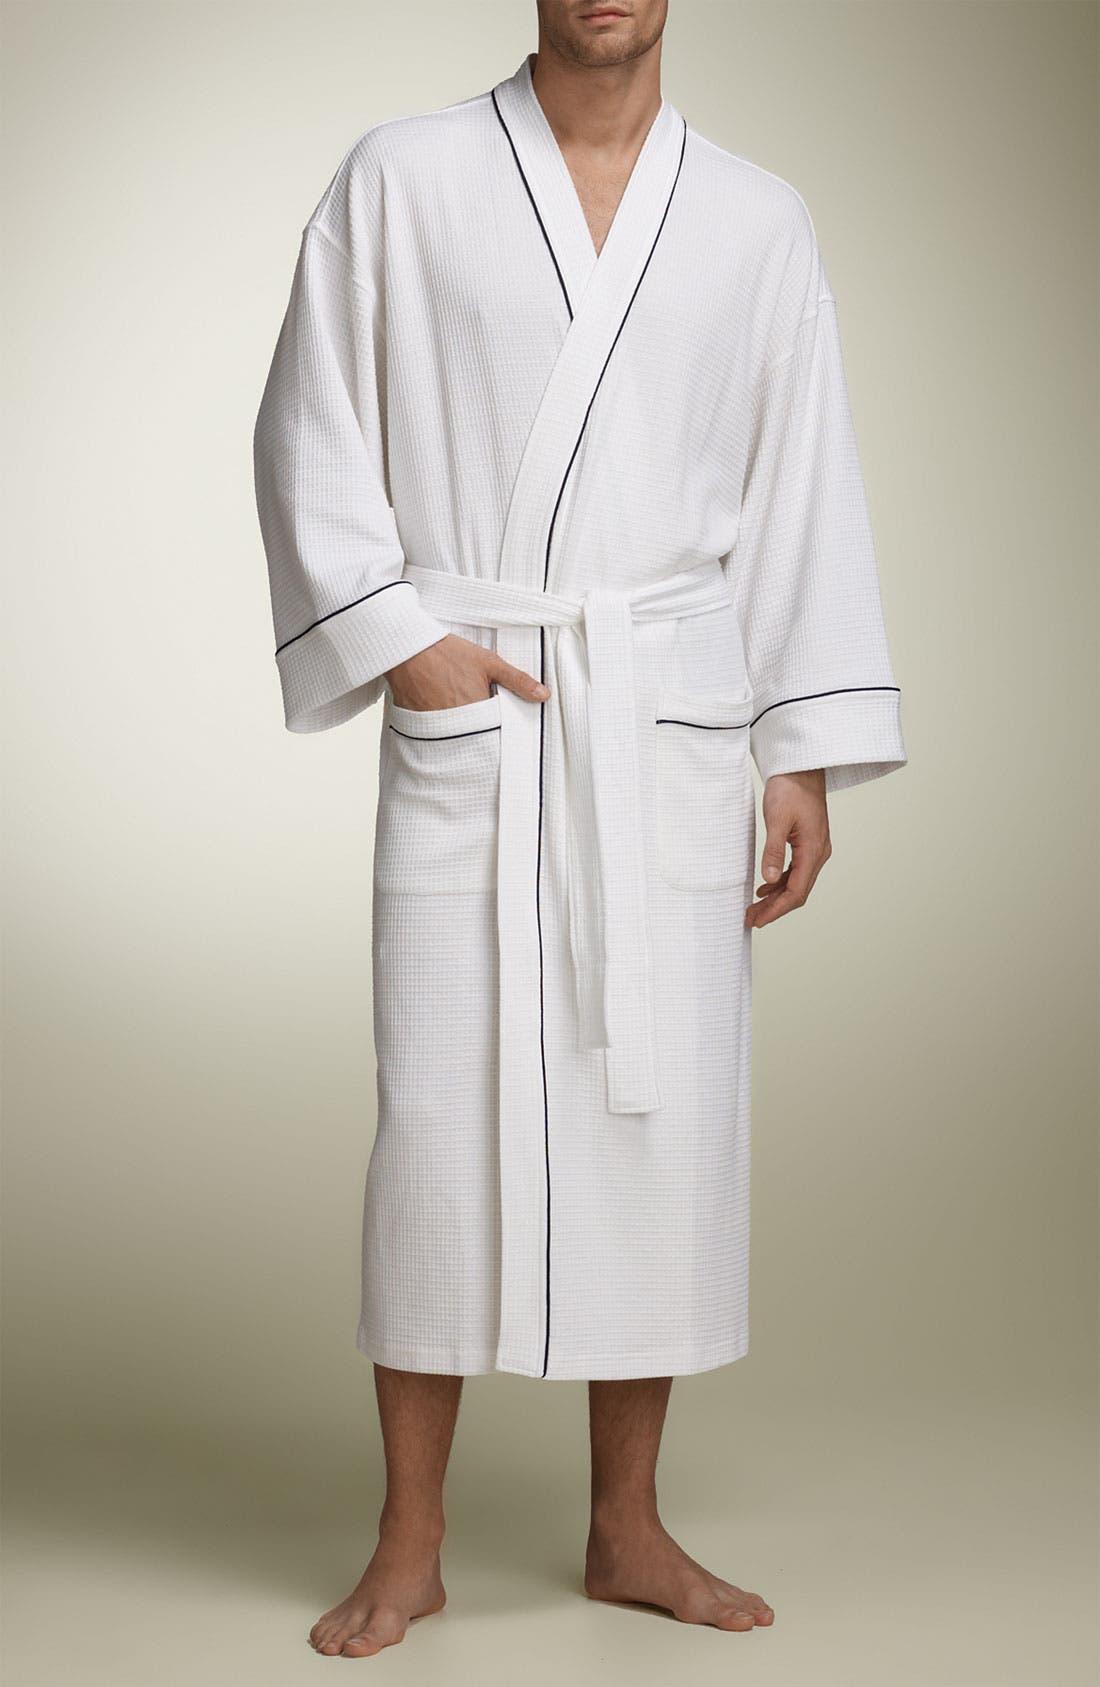 Alternate Image 1 Selected - Nordstrom Waffle Knit Kimono Robe